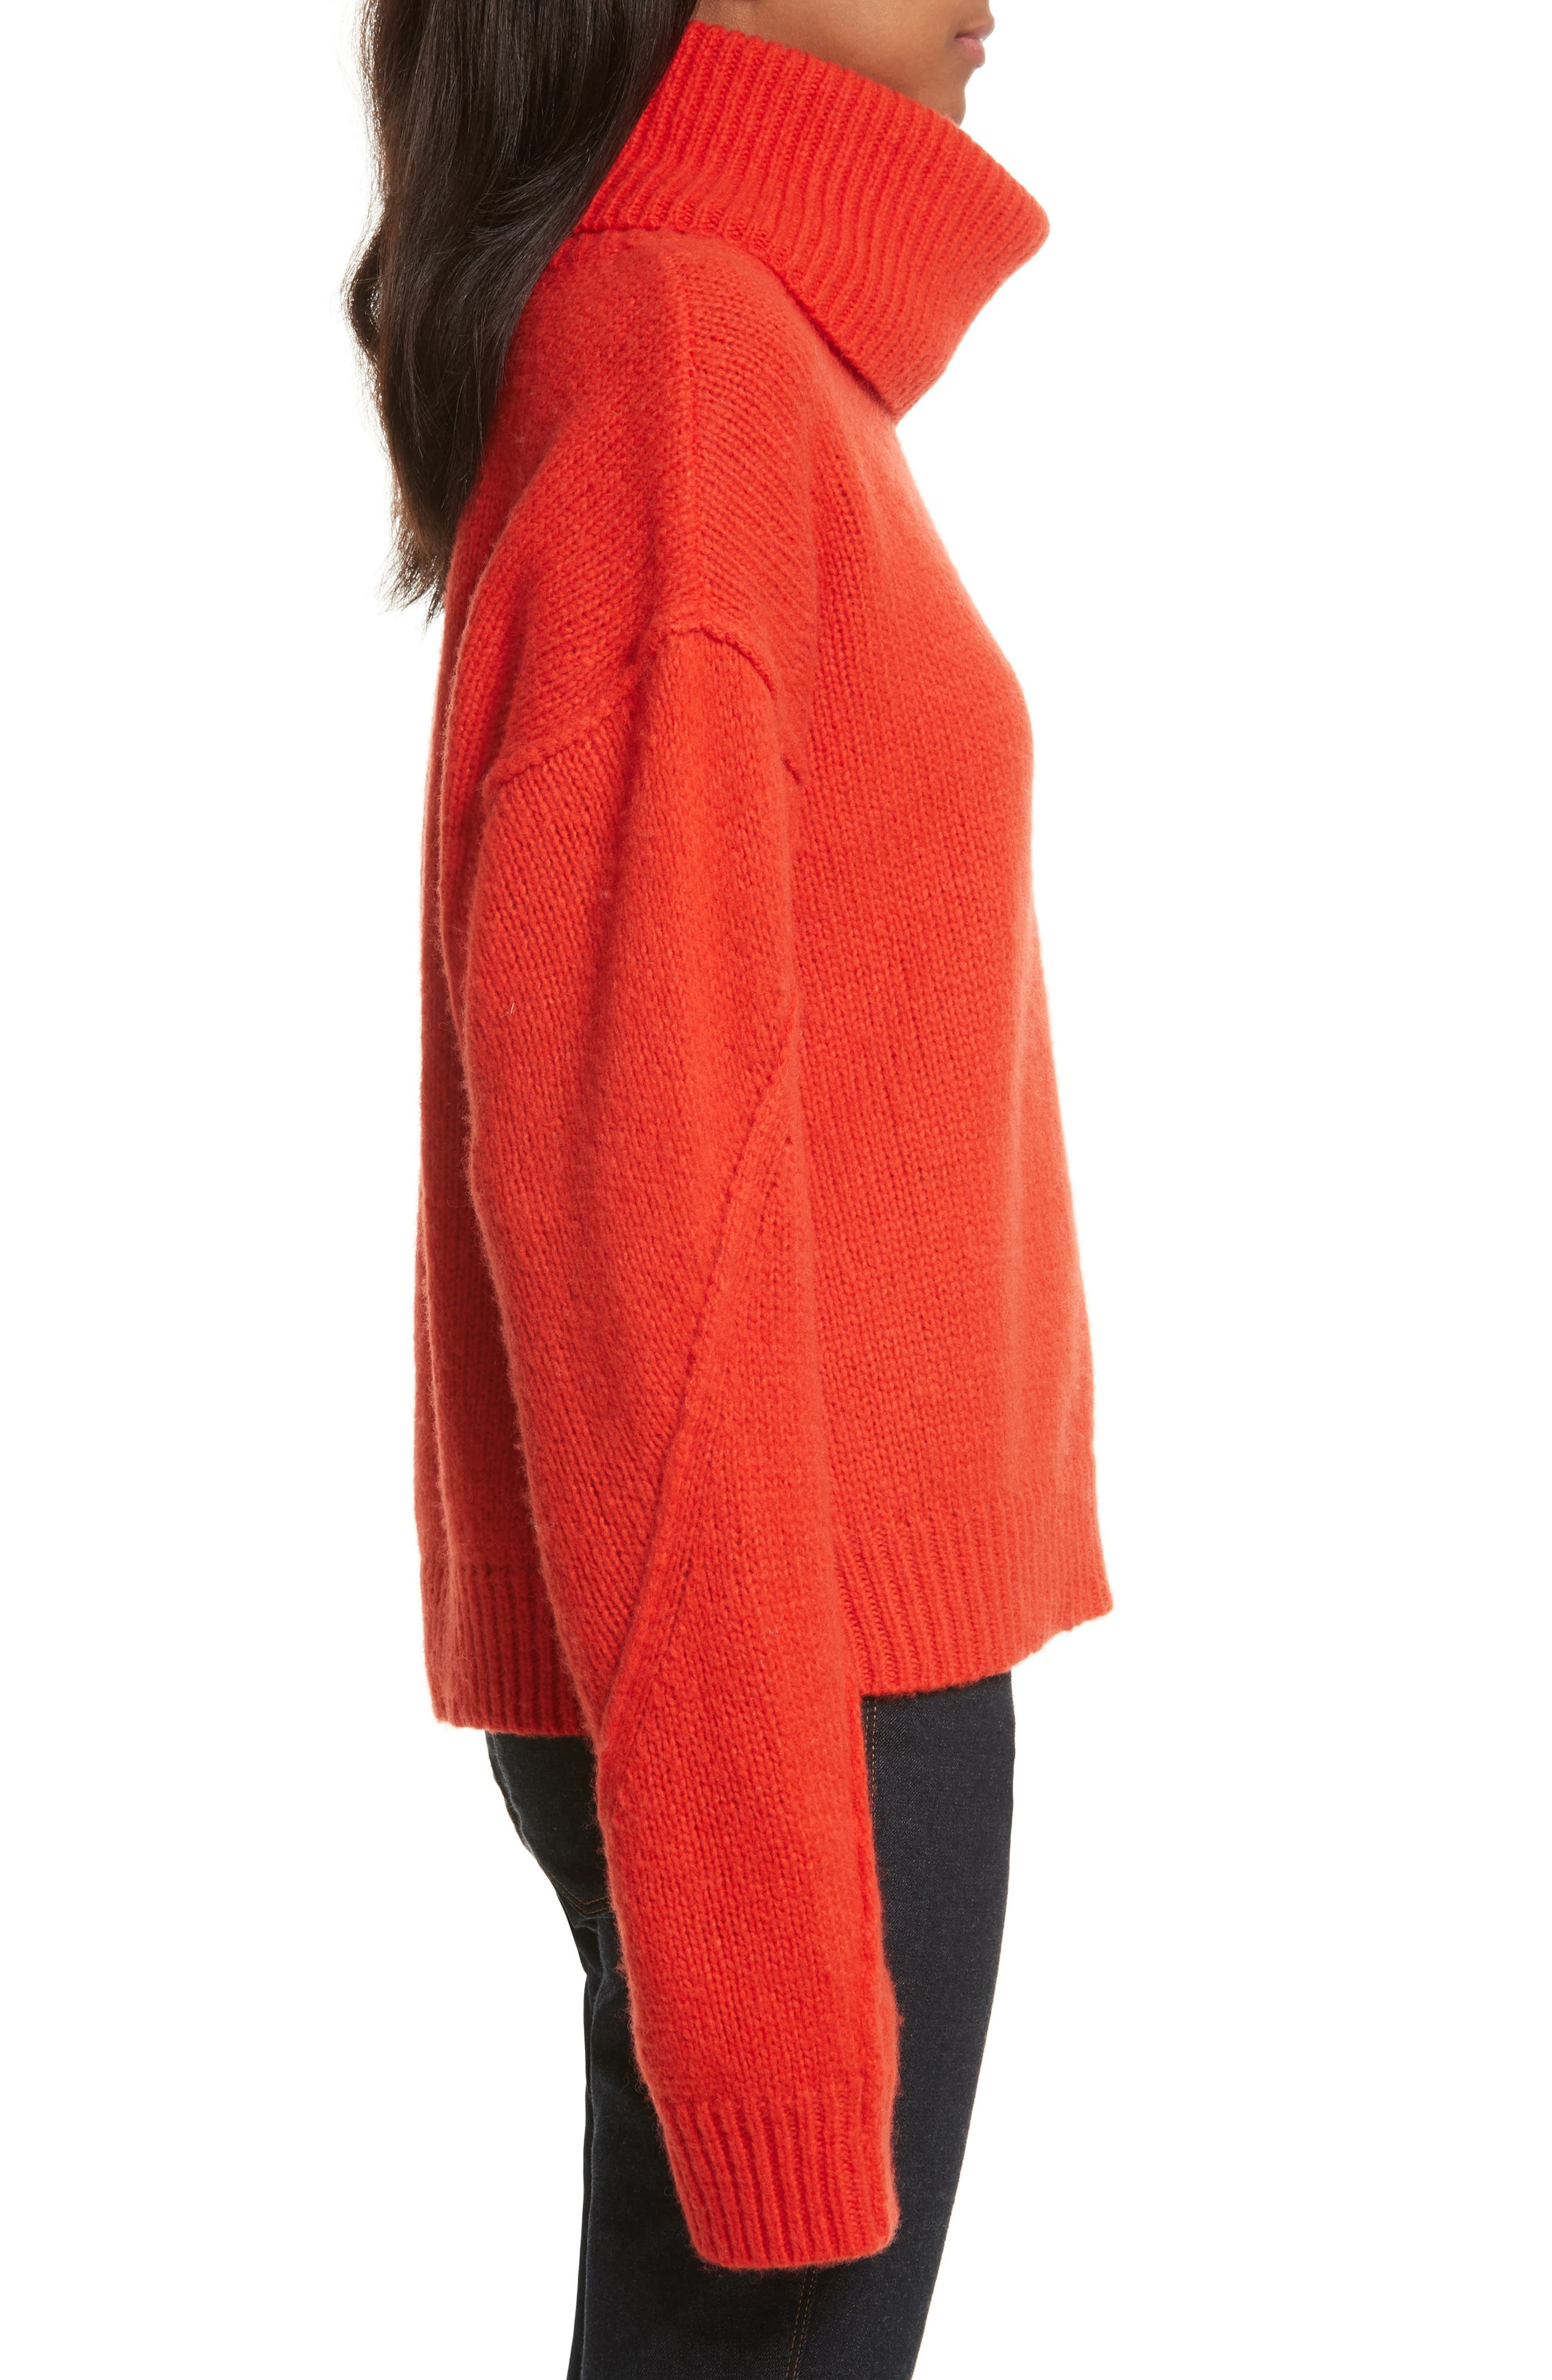 TORY BURCH Wools EVA REMOVABLE TURTLENECK SWEATER